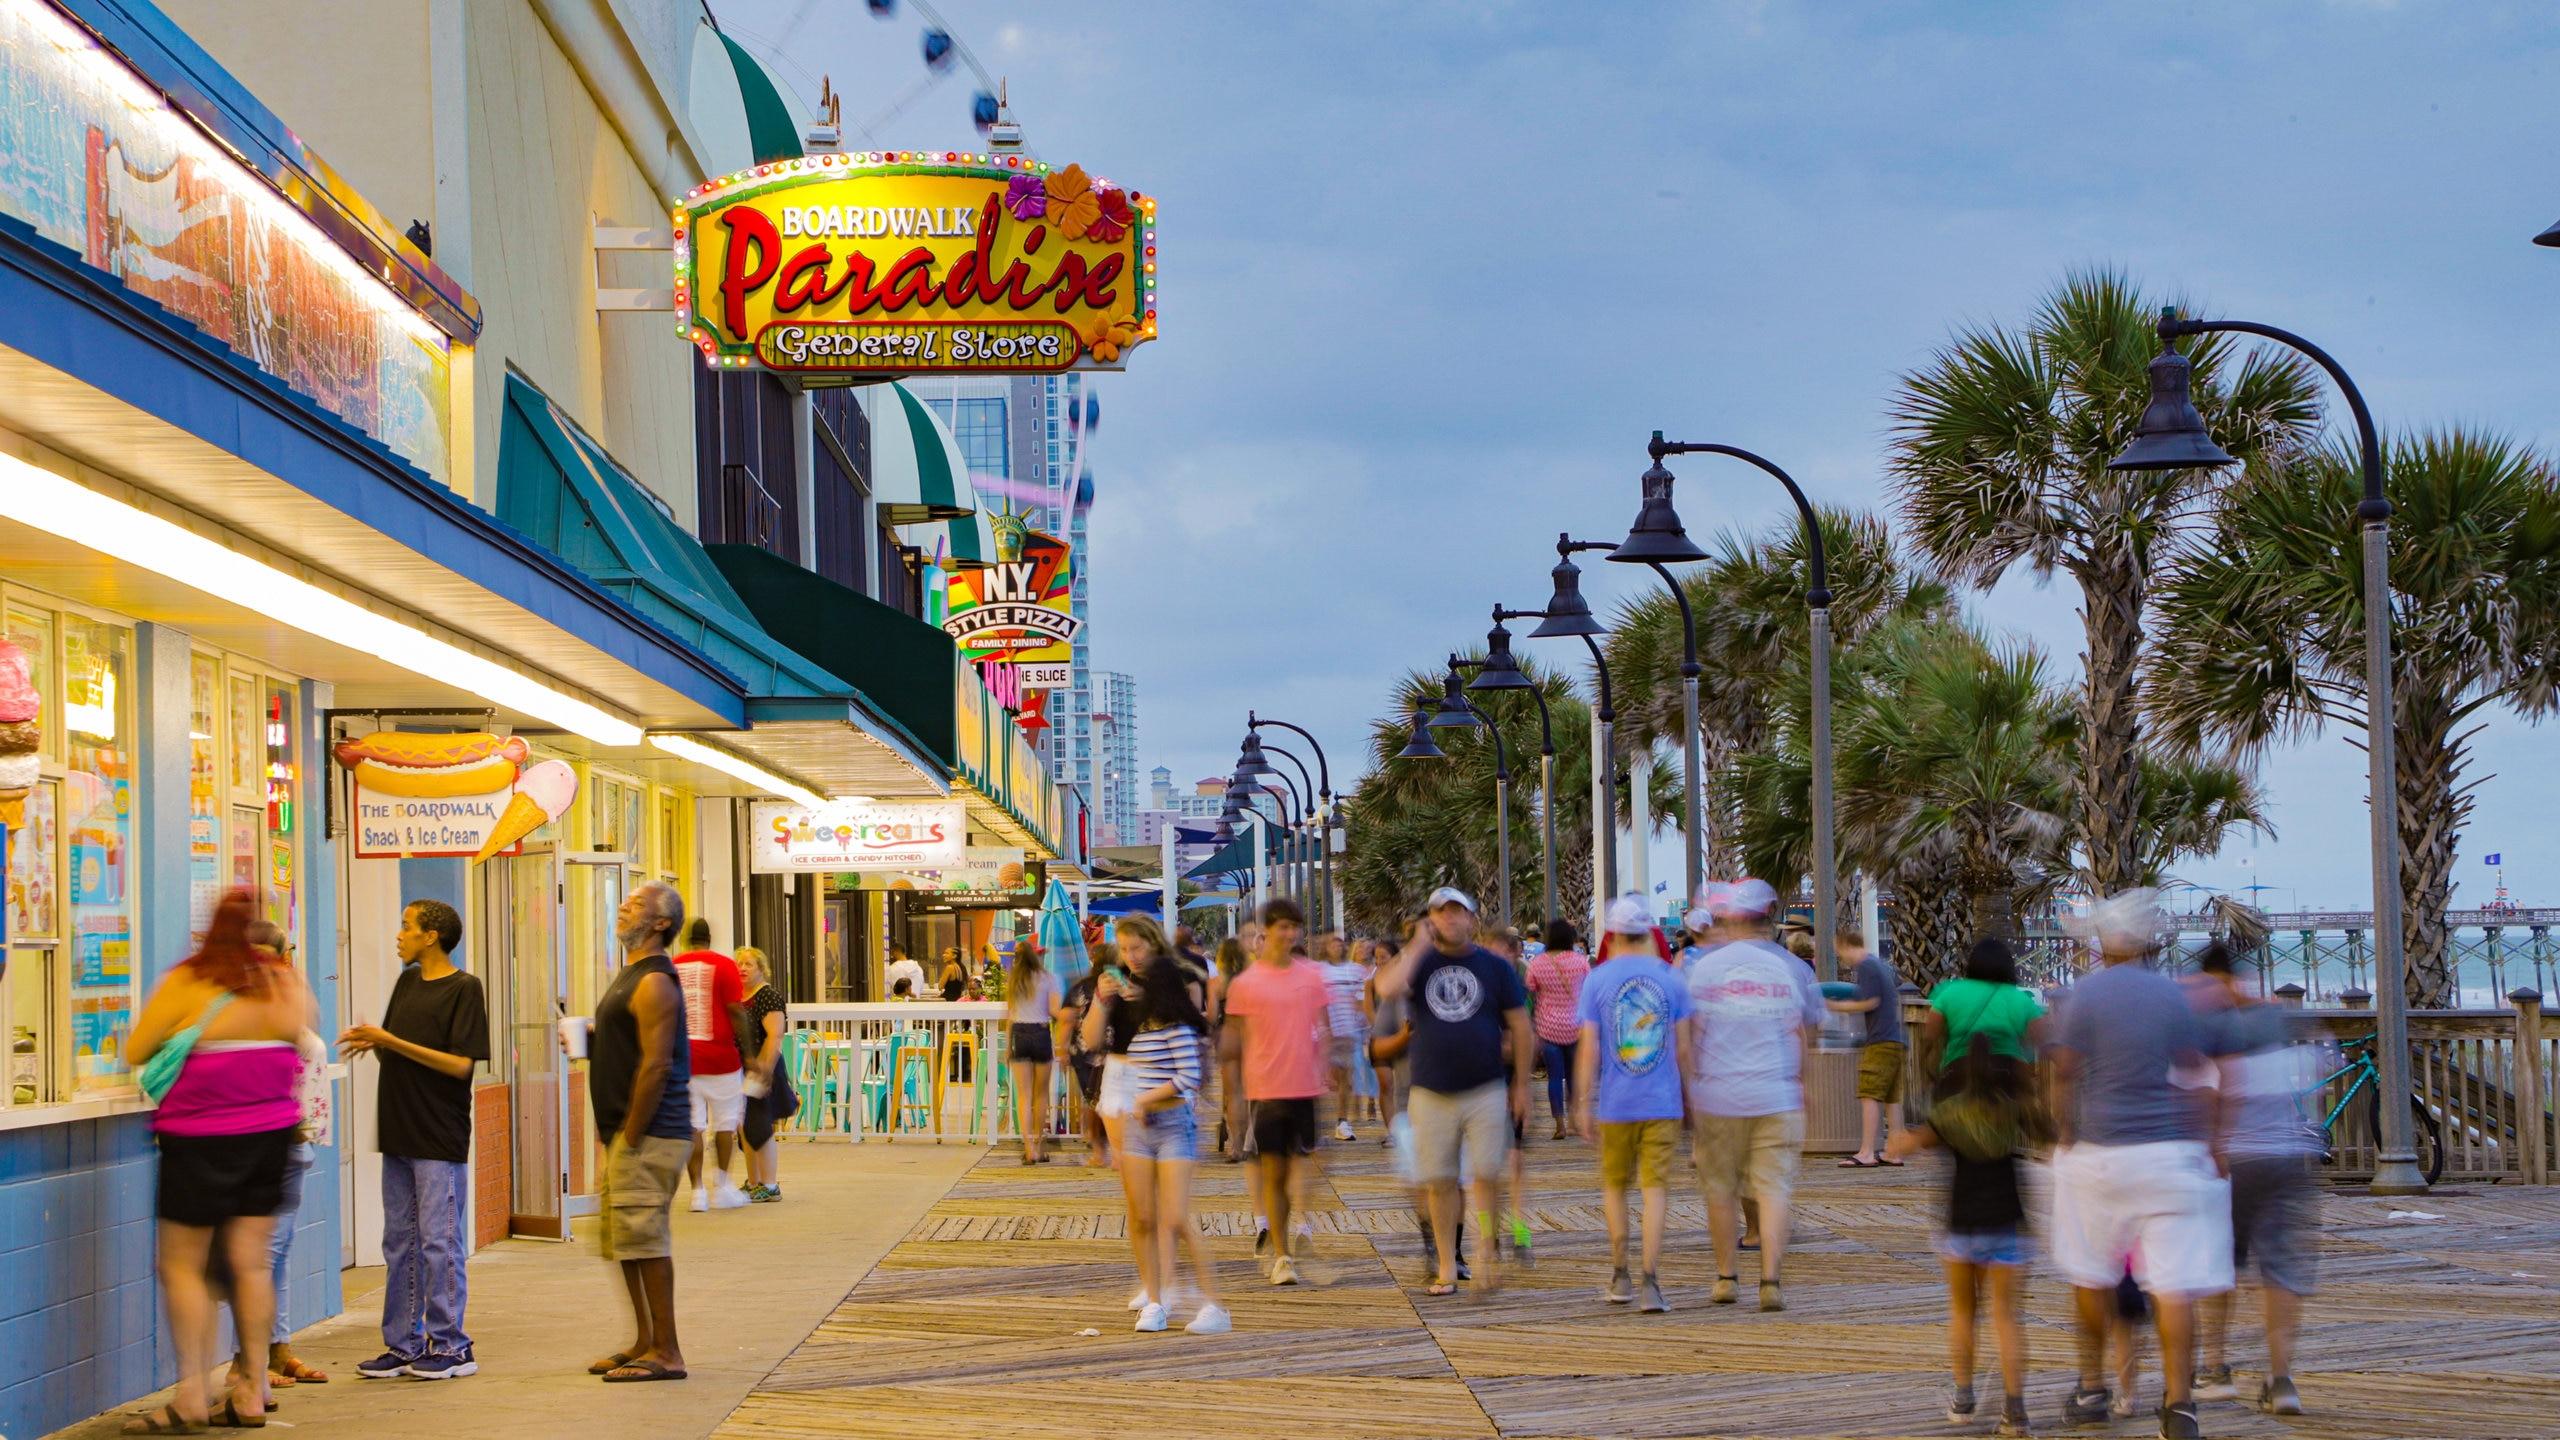 Myrtle Beach Boardwalk, Myrtle Beach, South Carolina, United States of America